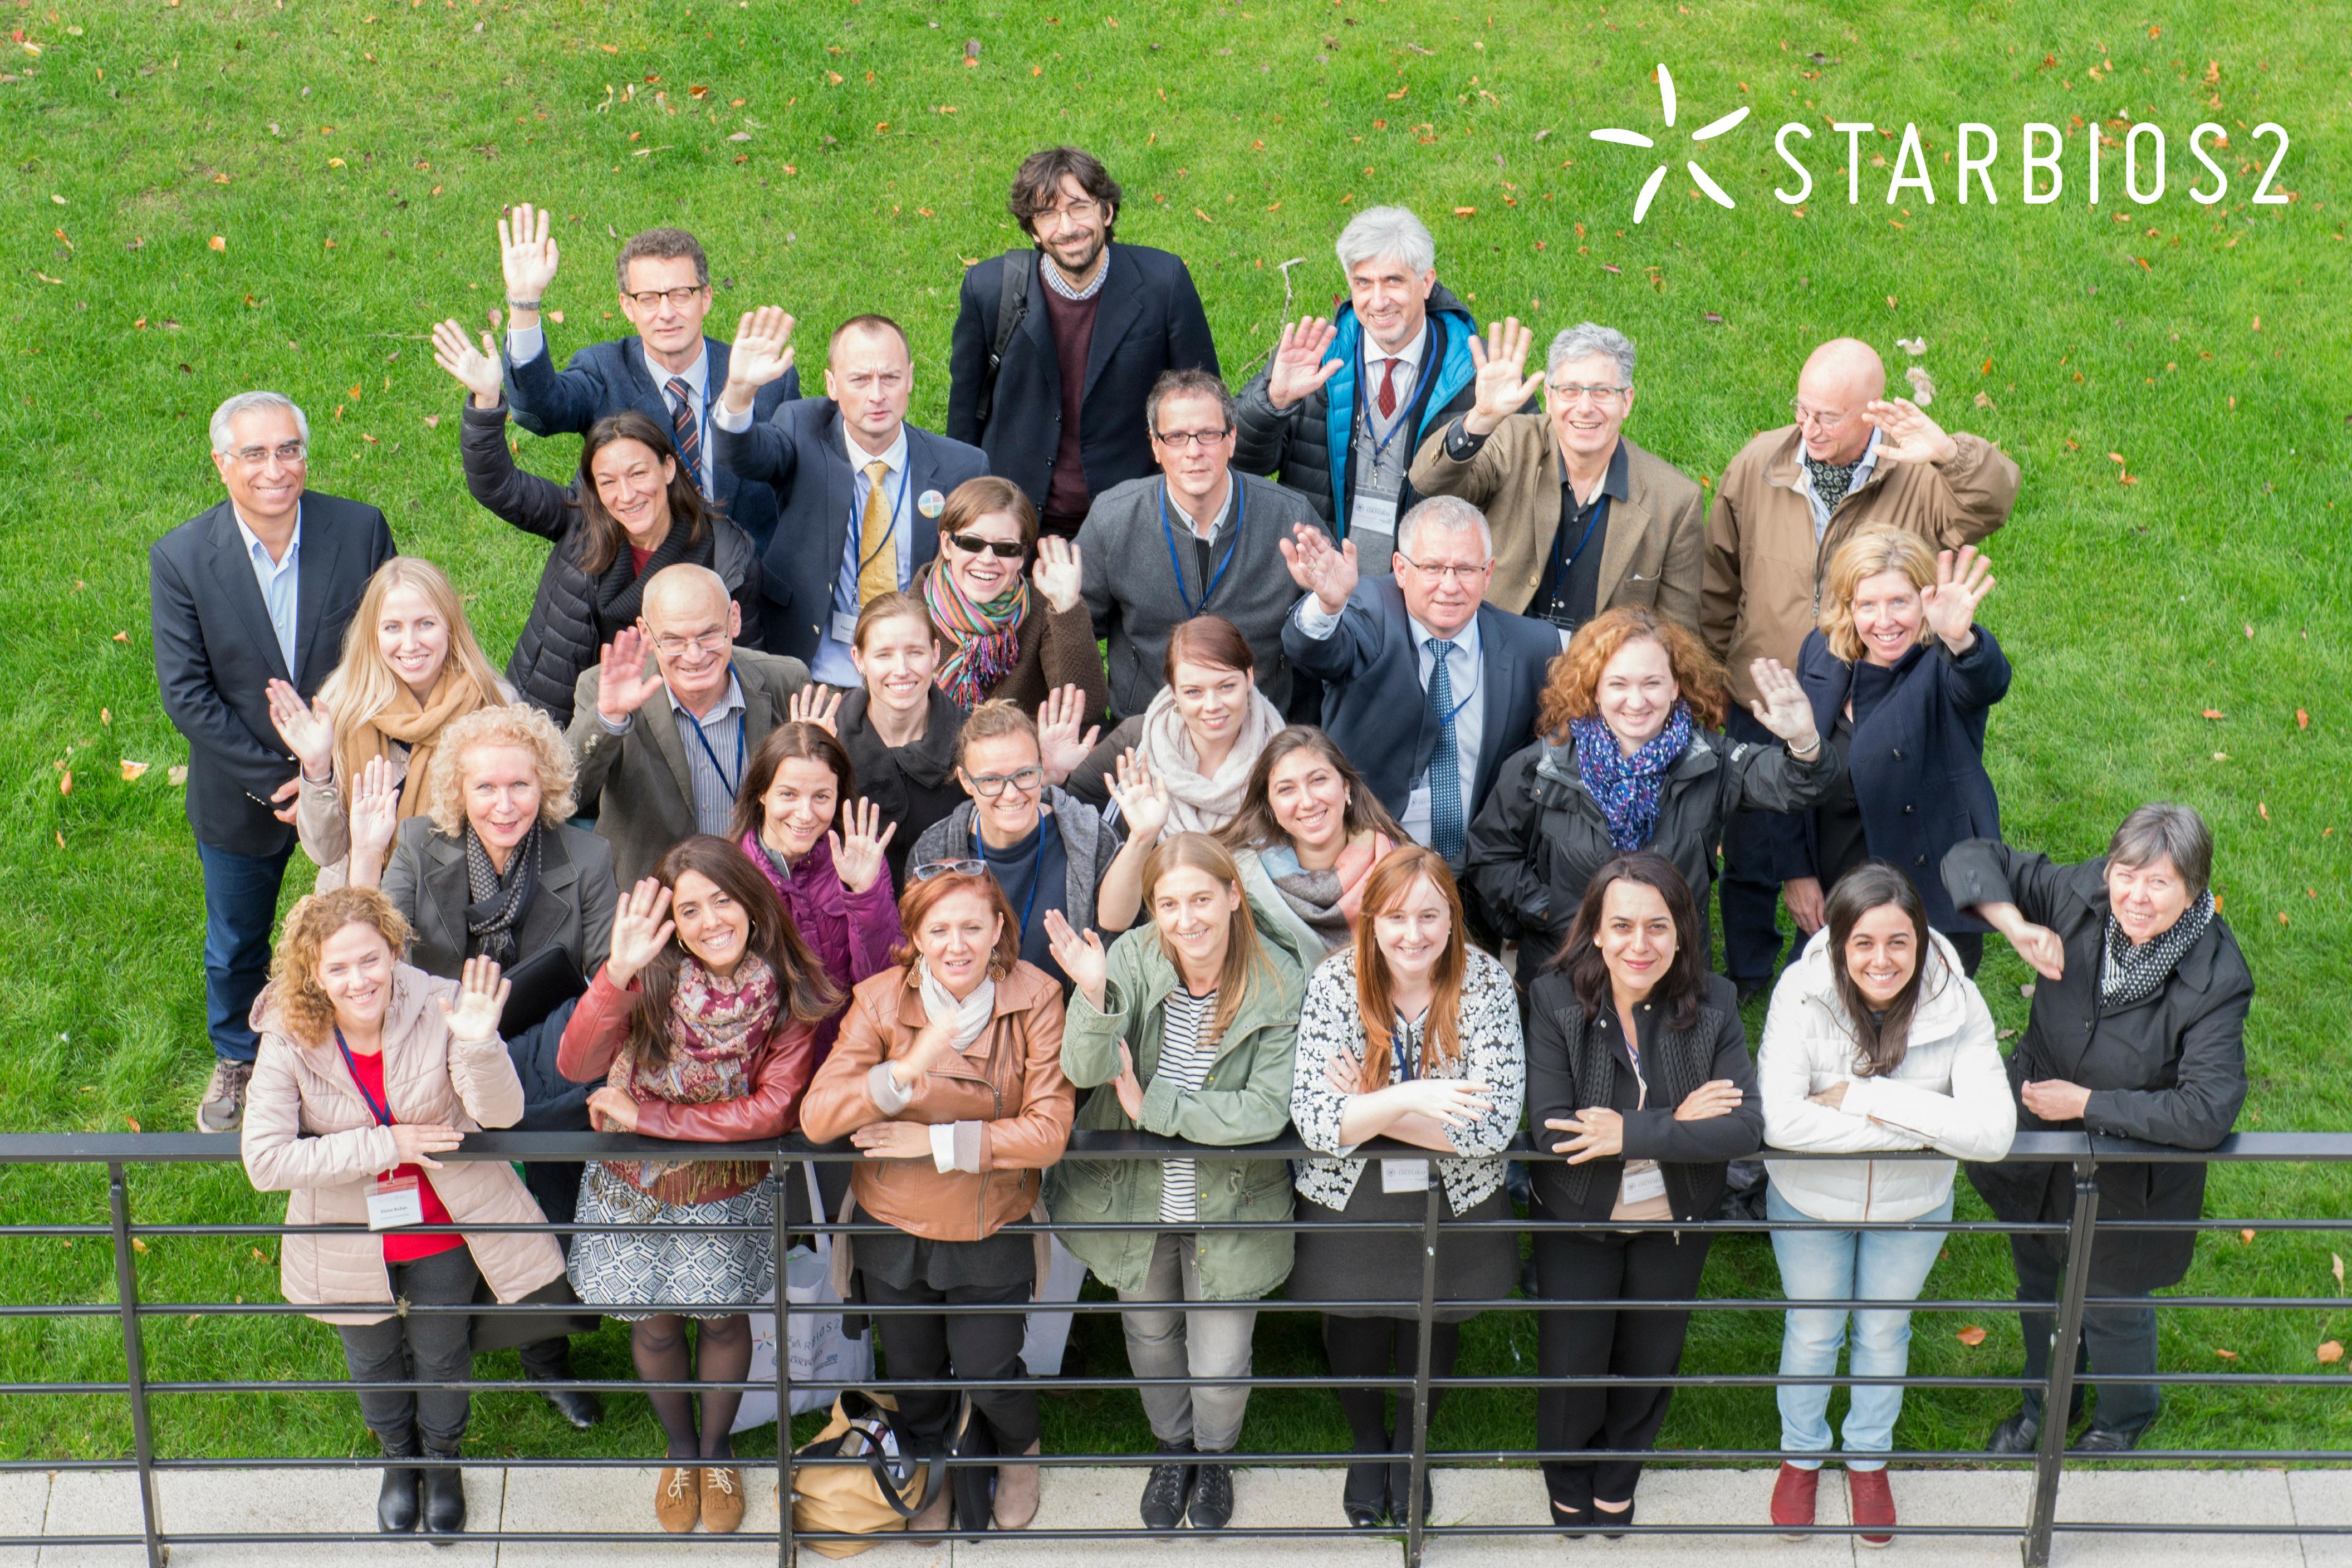 STARBIOS2 partners